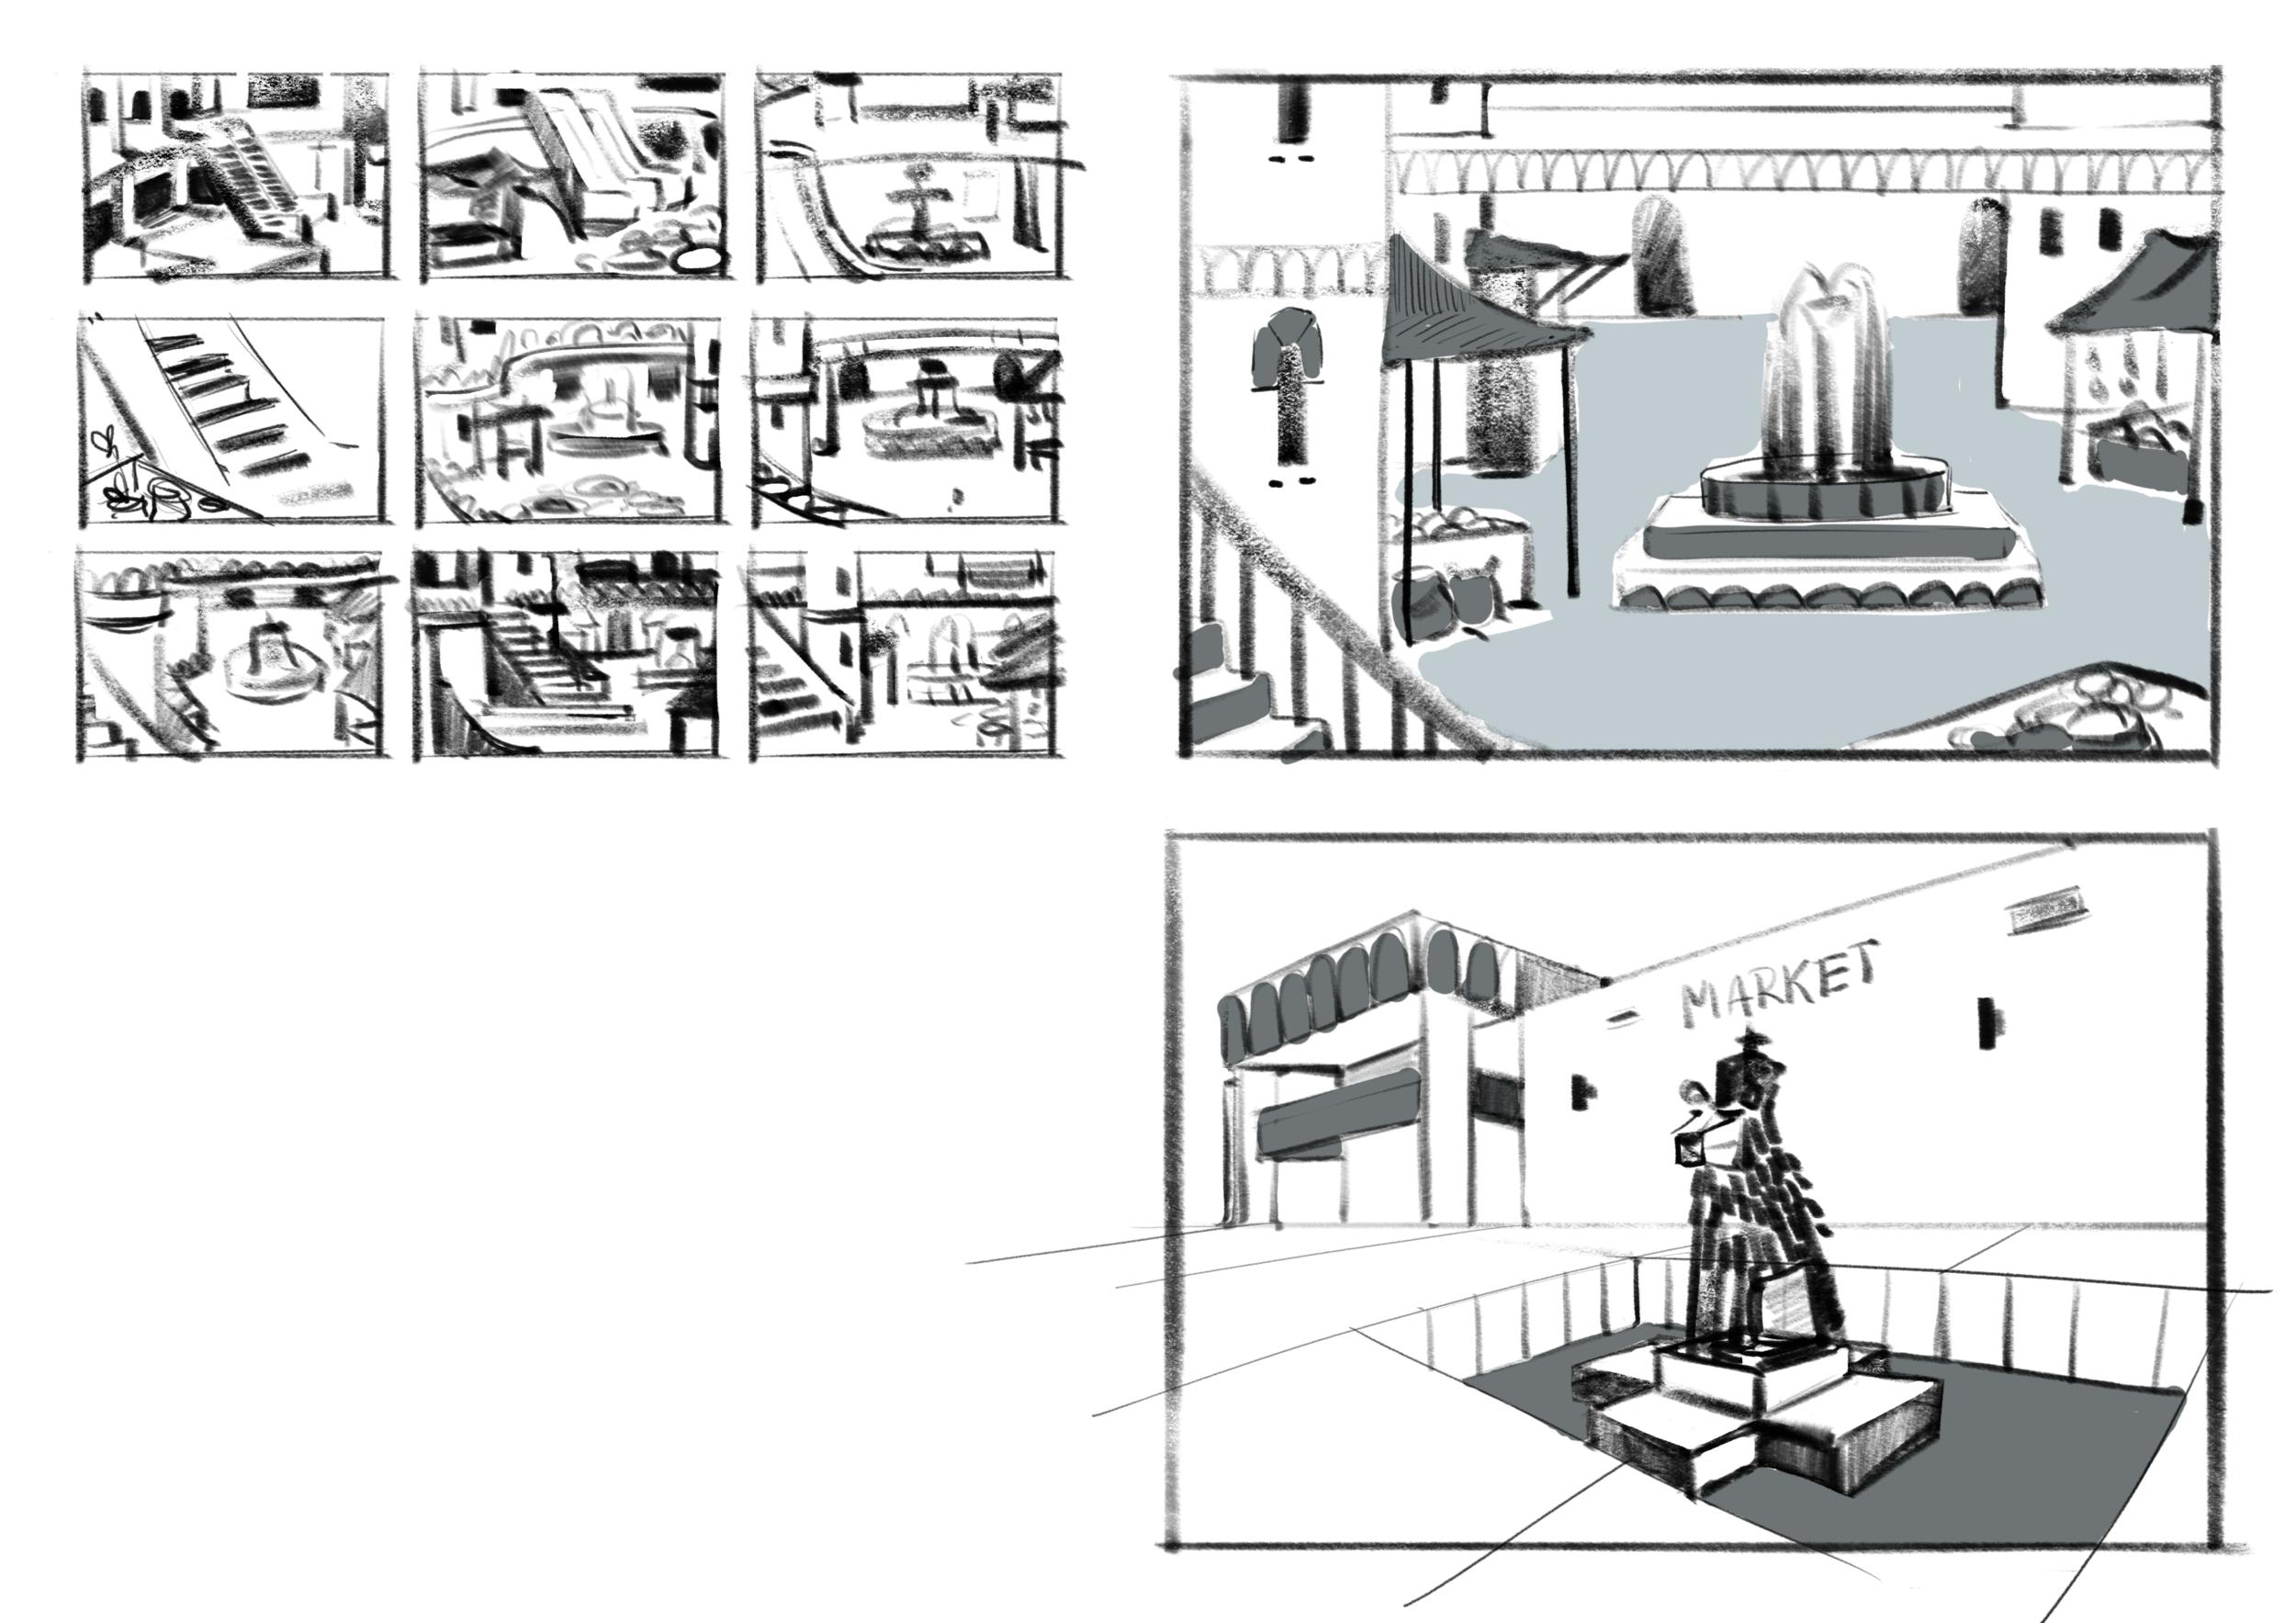 Concept thumbnails and tonal sketches